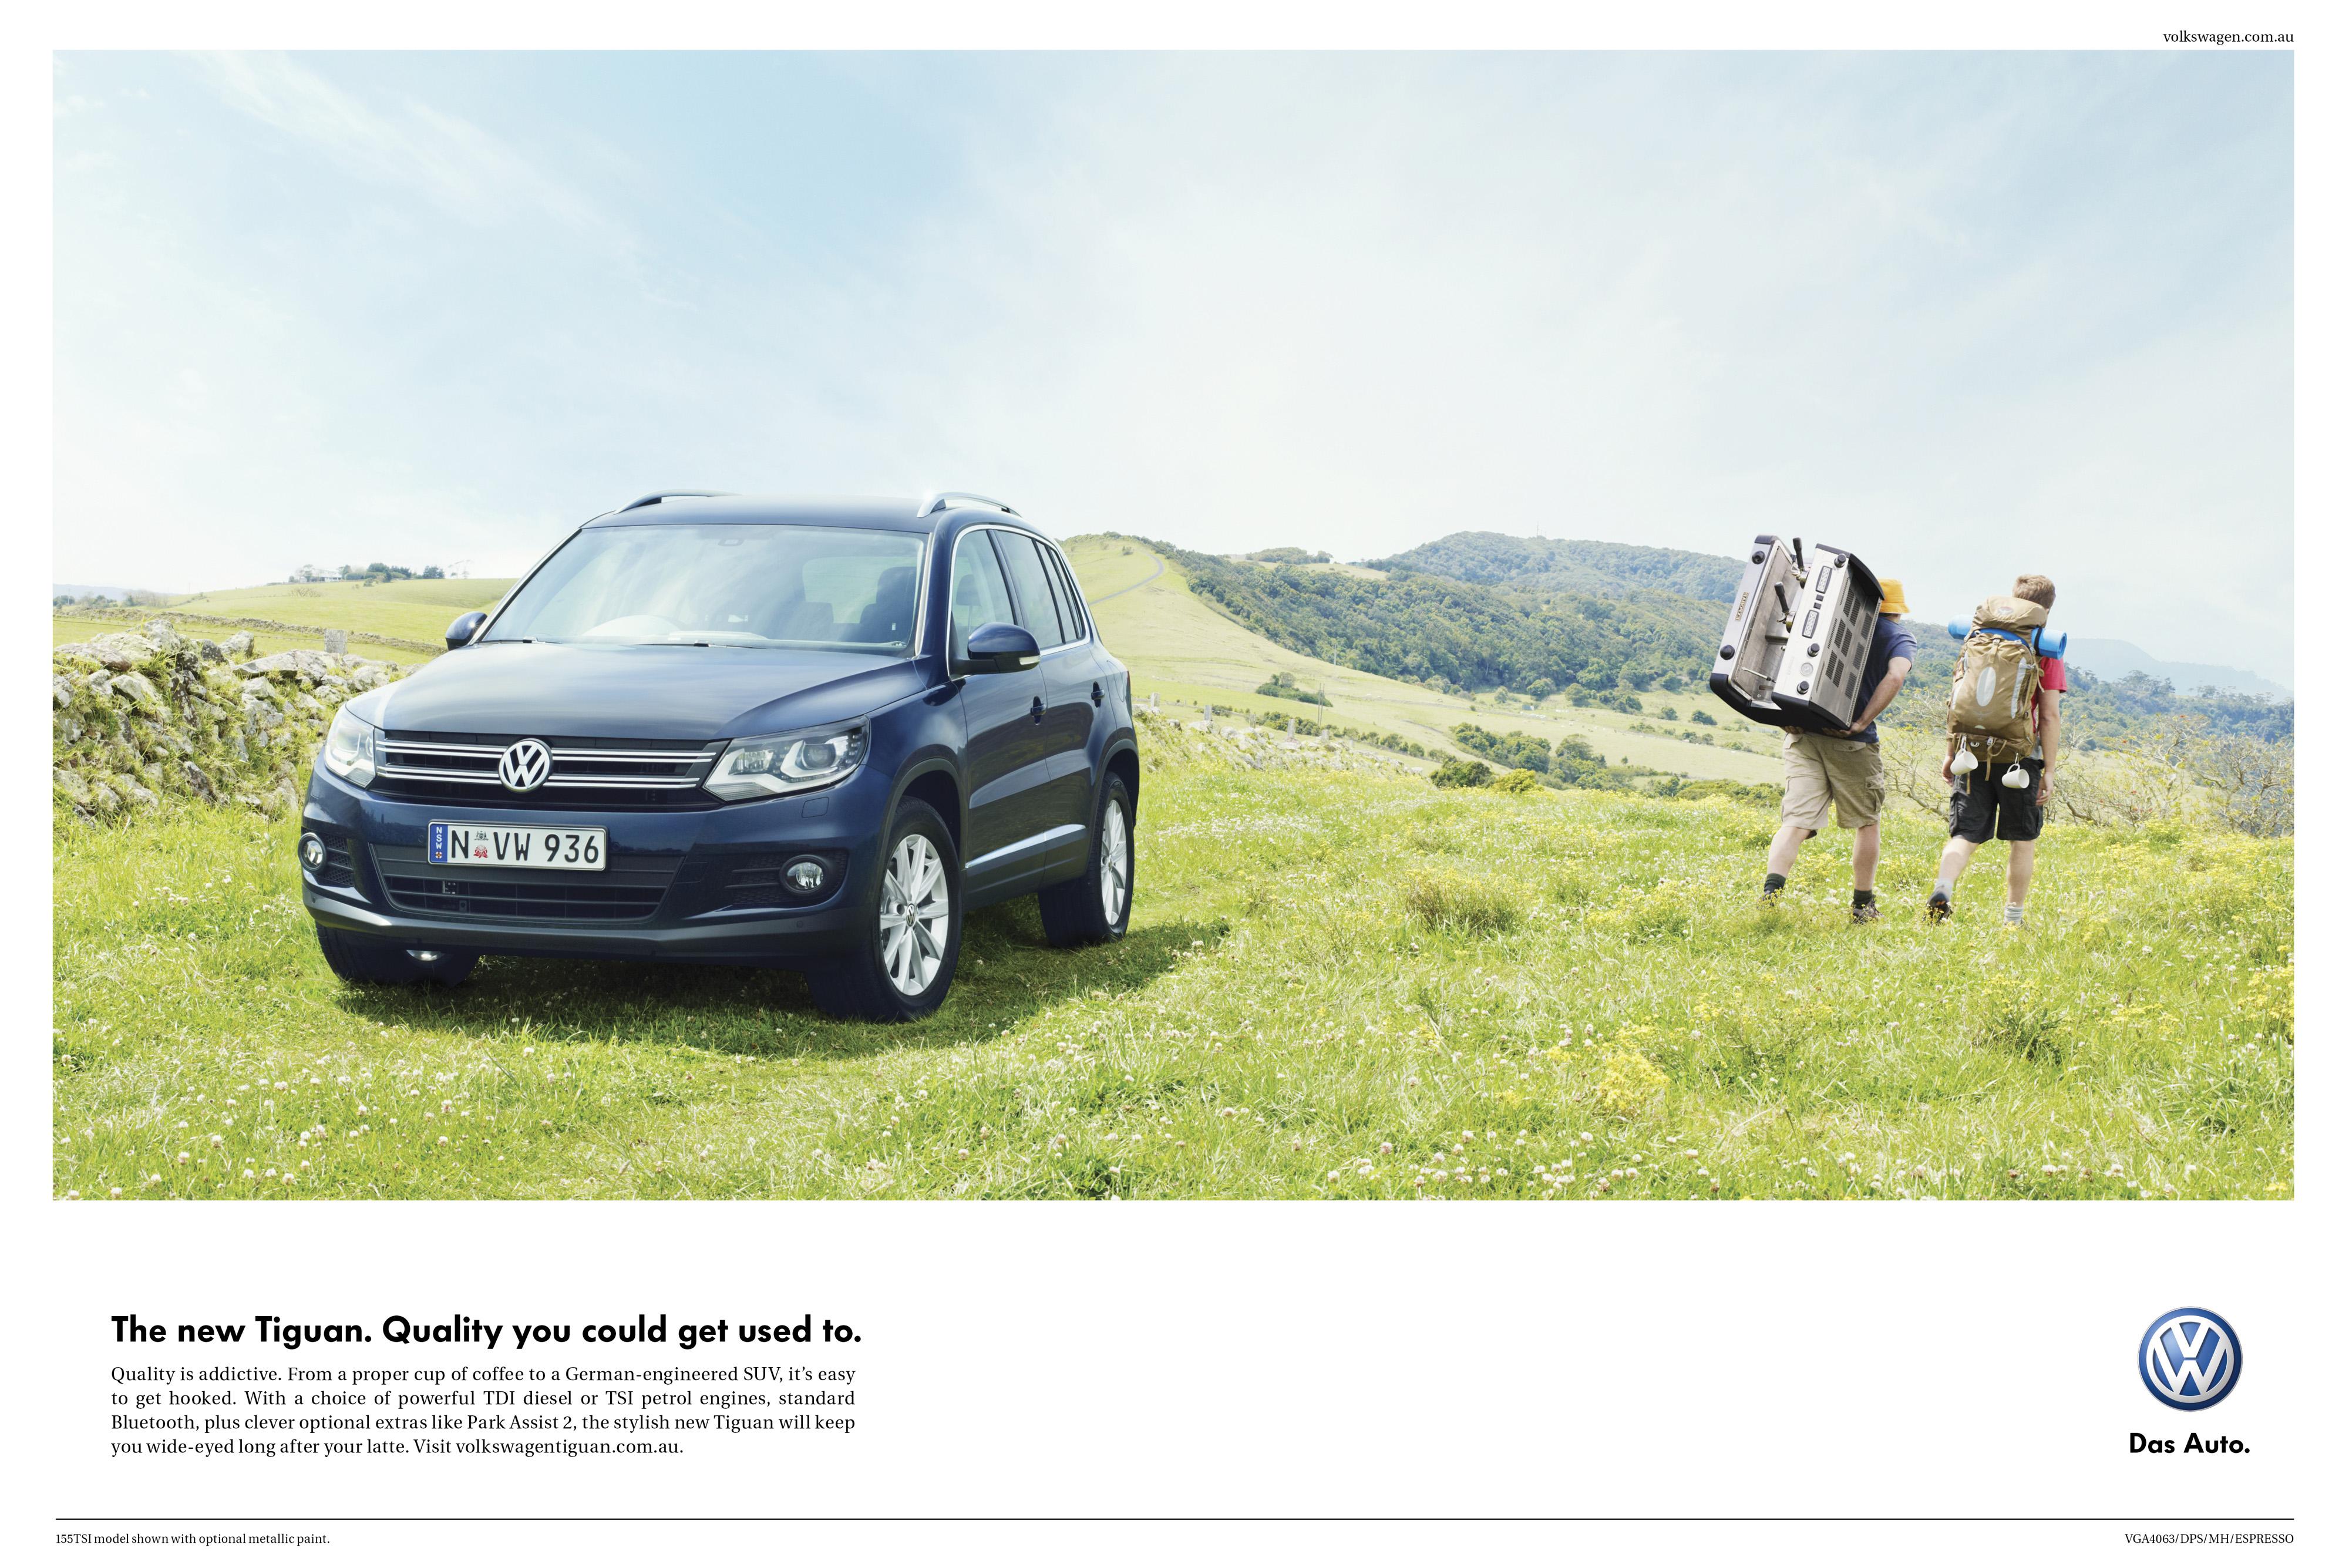 Print Ad Volkswagen Tiguan Espresso